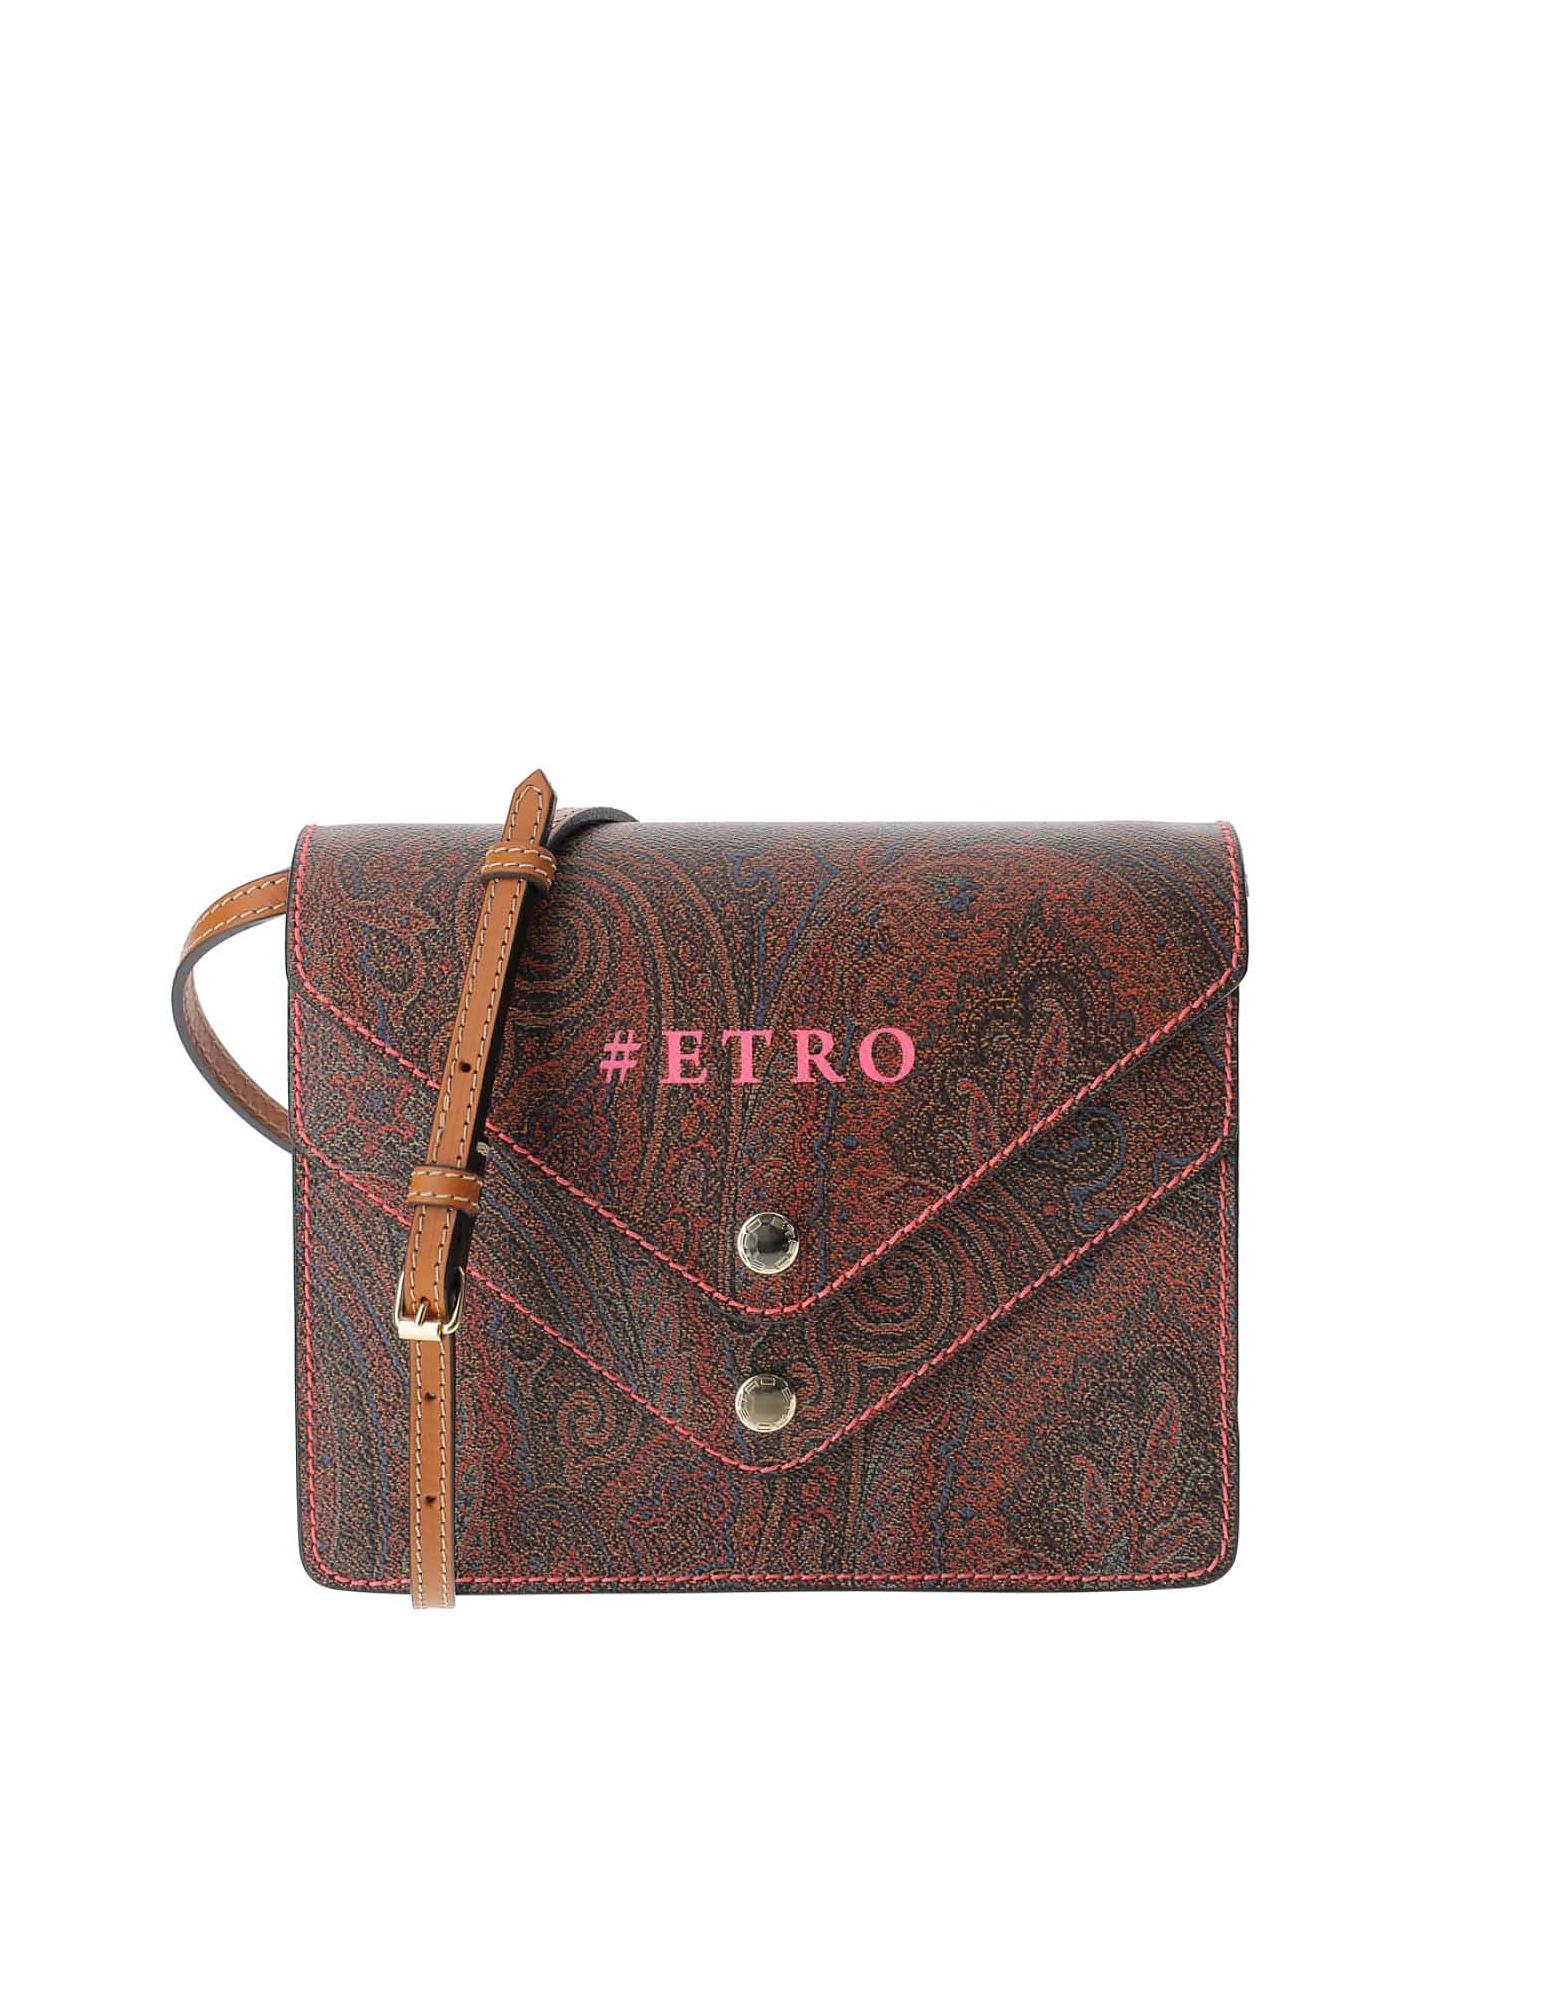 Etro Designer Handbags, Paisley Jacquard Canvas Double Flap Front Crossbody Bag